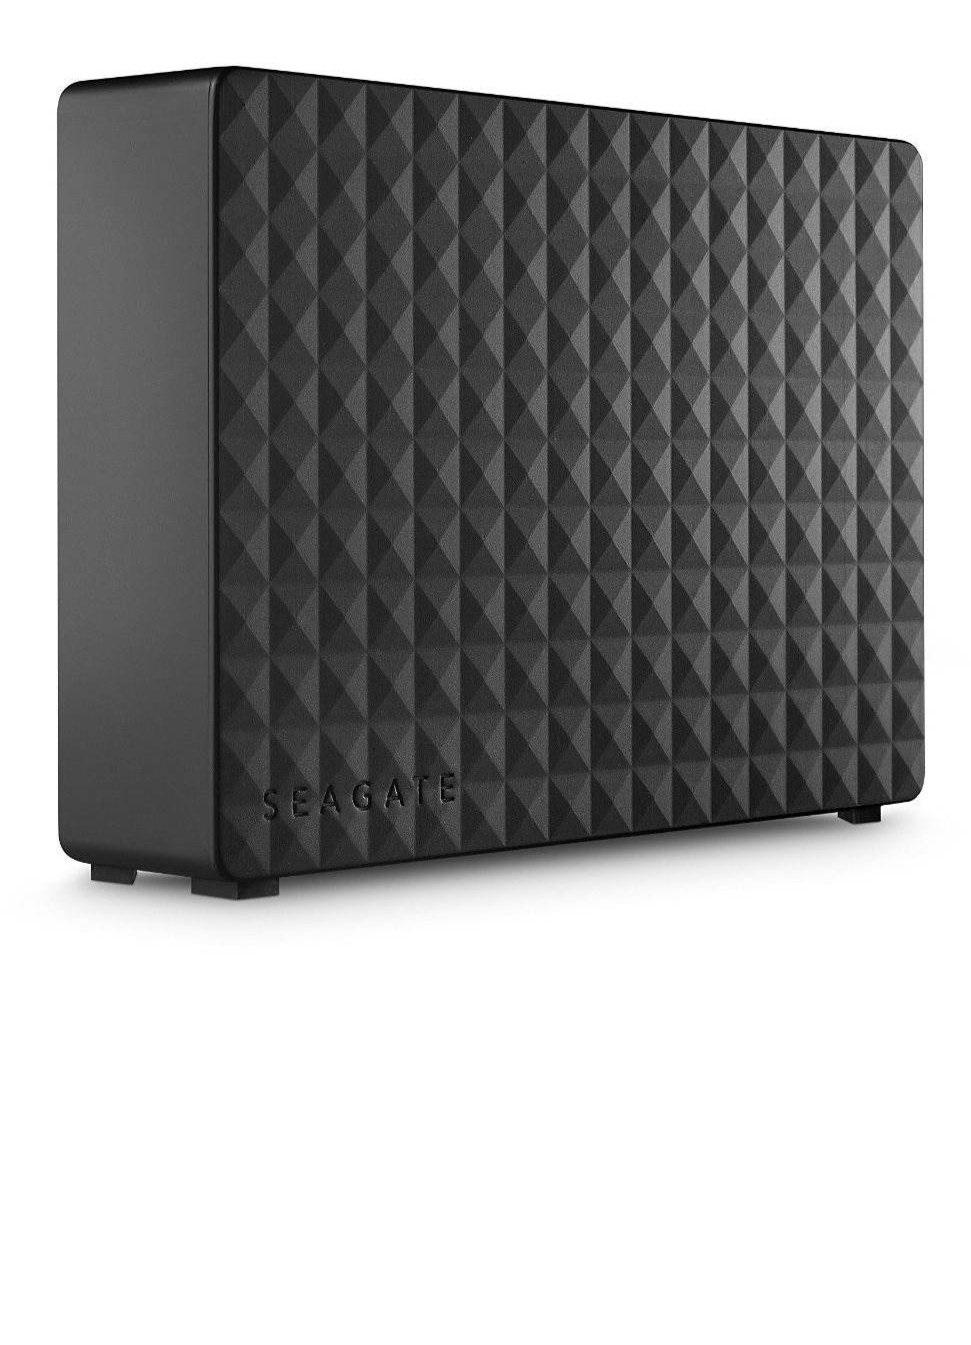 Externí disk Seagate Expansion Desktop